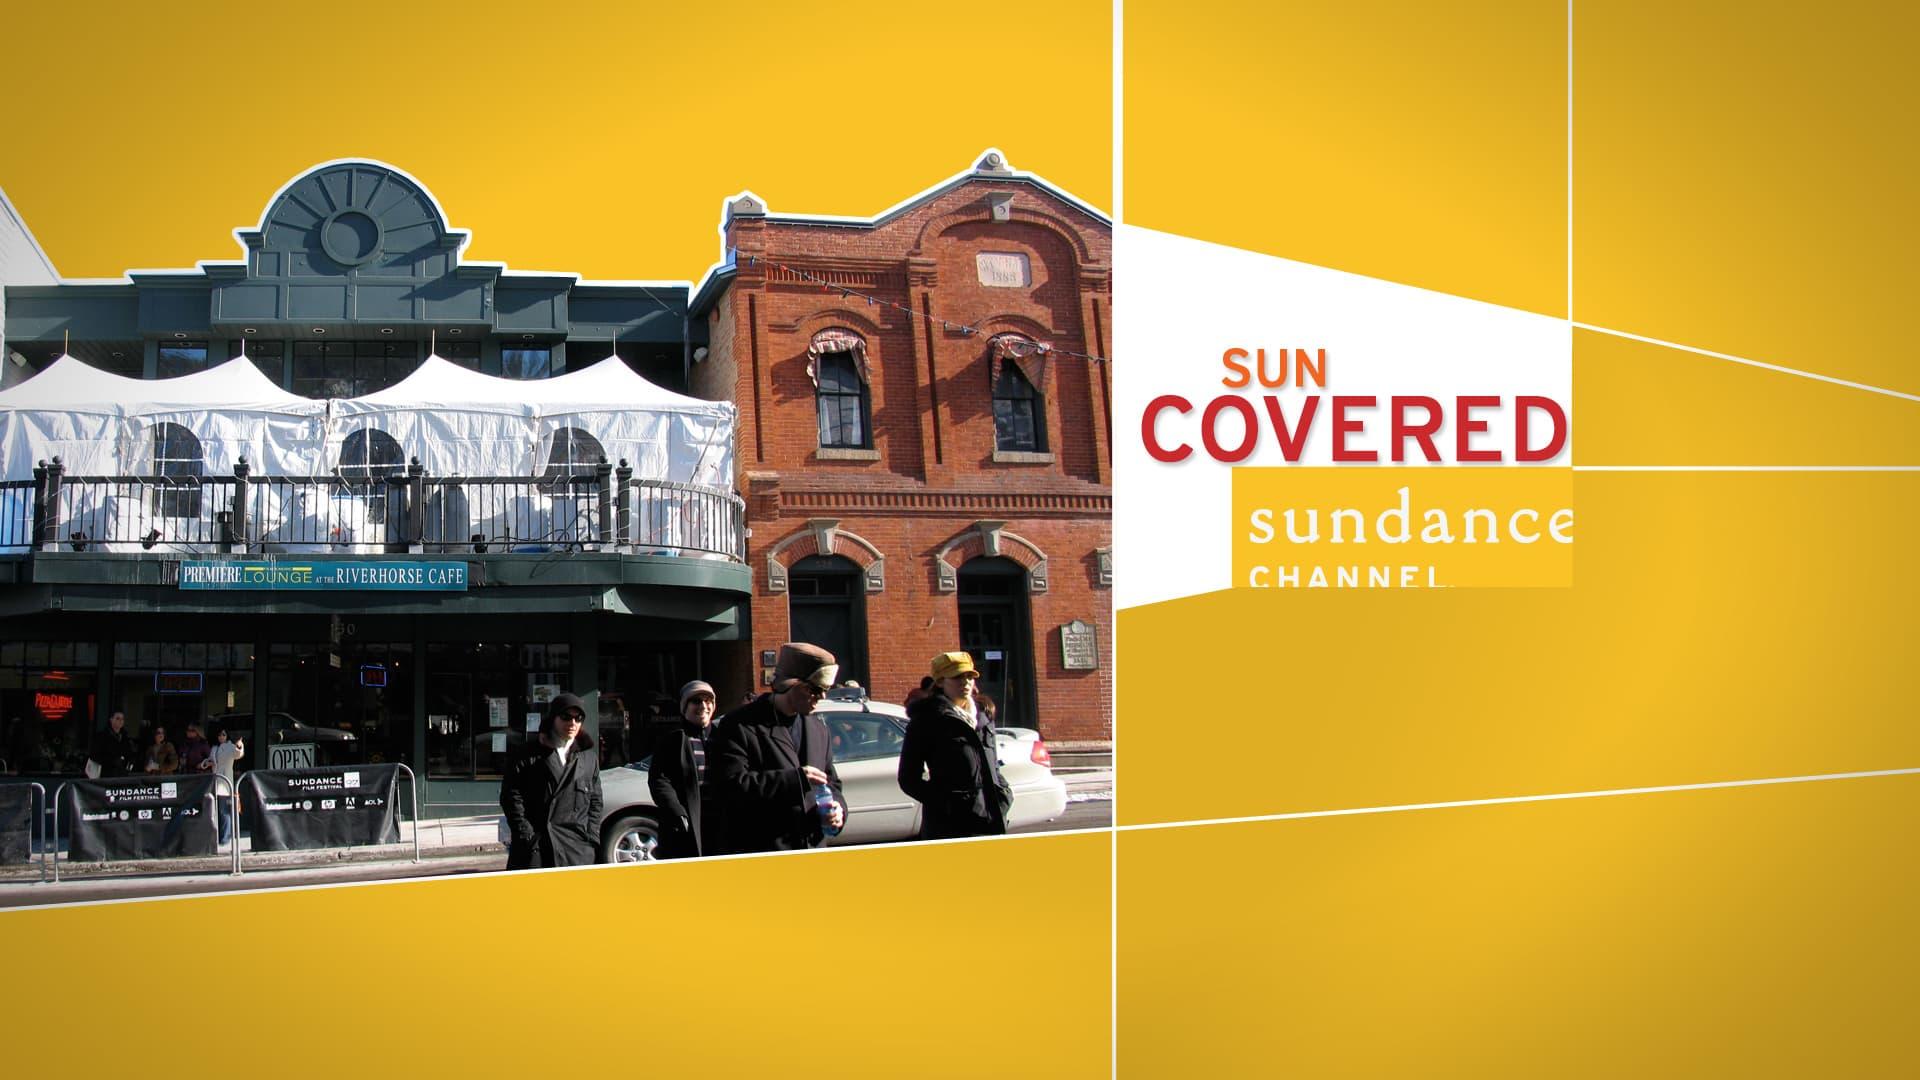 Sundance_SC-victor-ruano